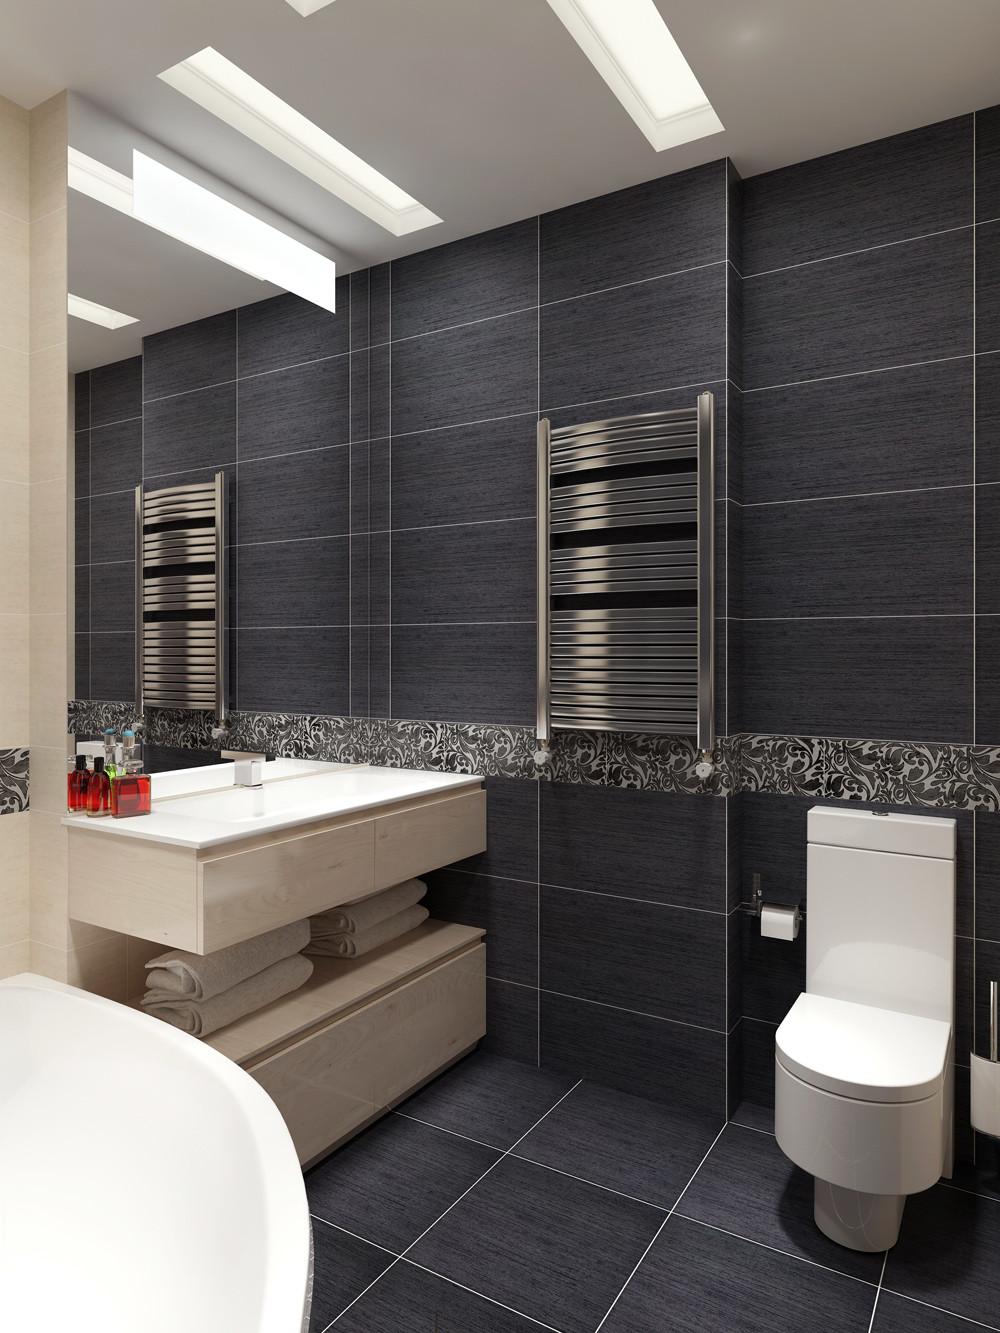 bathroom tiles design 2019